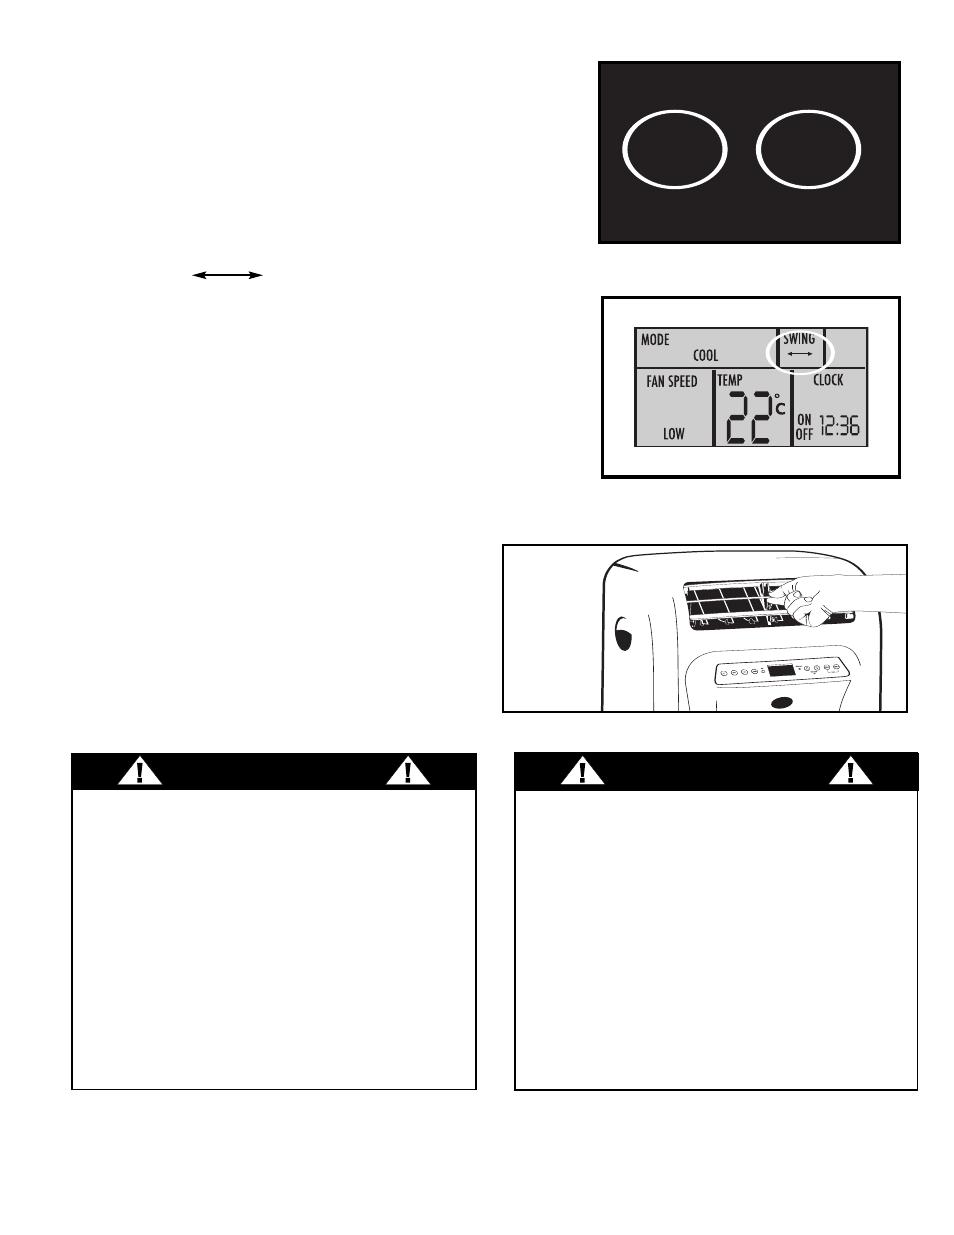 i o mode fan swi ng run danby dpac10030 user manual page 26 65 rh manualsdir com Manual Logo Clip Art Manual Mode